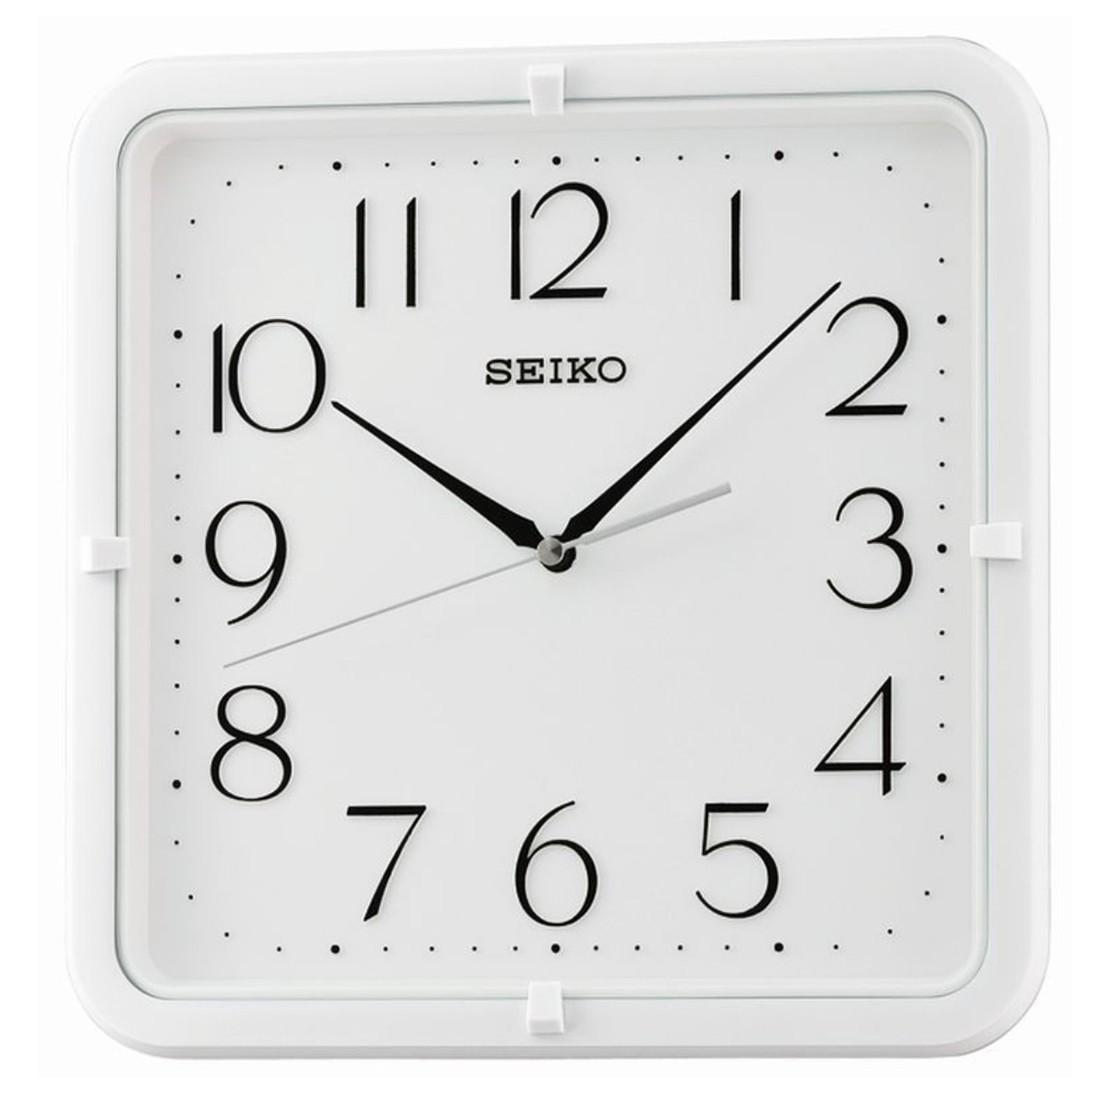 Seiko QXA731AN Analog Wall Clock QXA731A QXA731